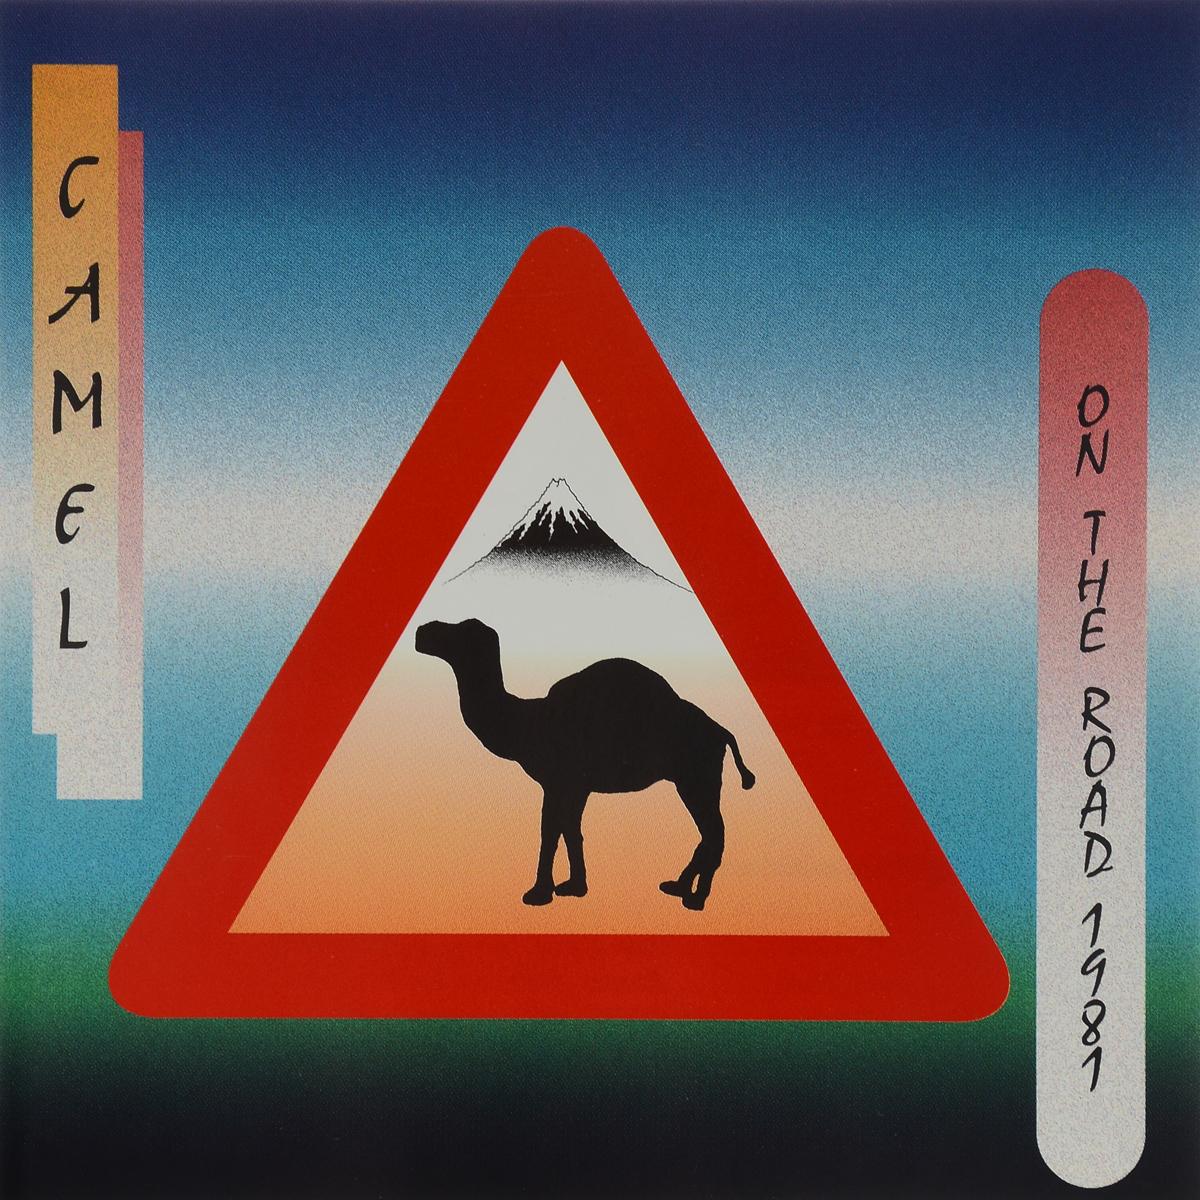 Camel Camel. Camel On The Road 1981 camel southampton